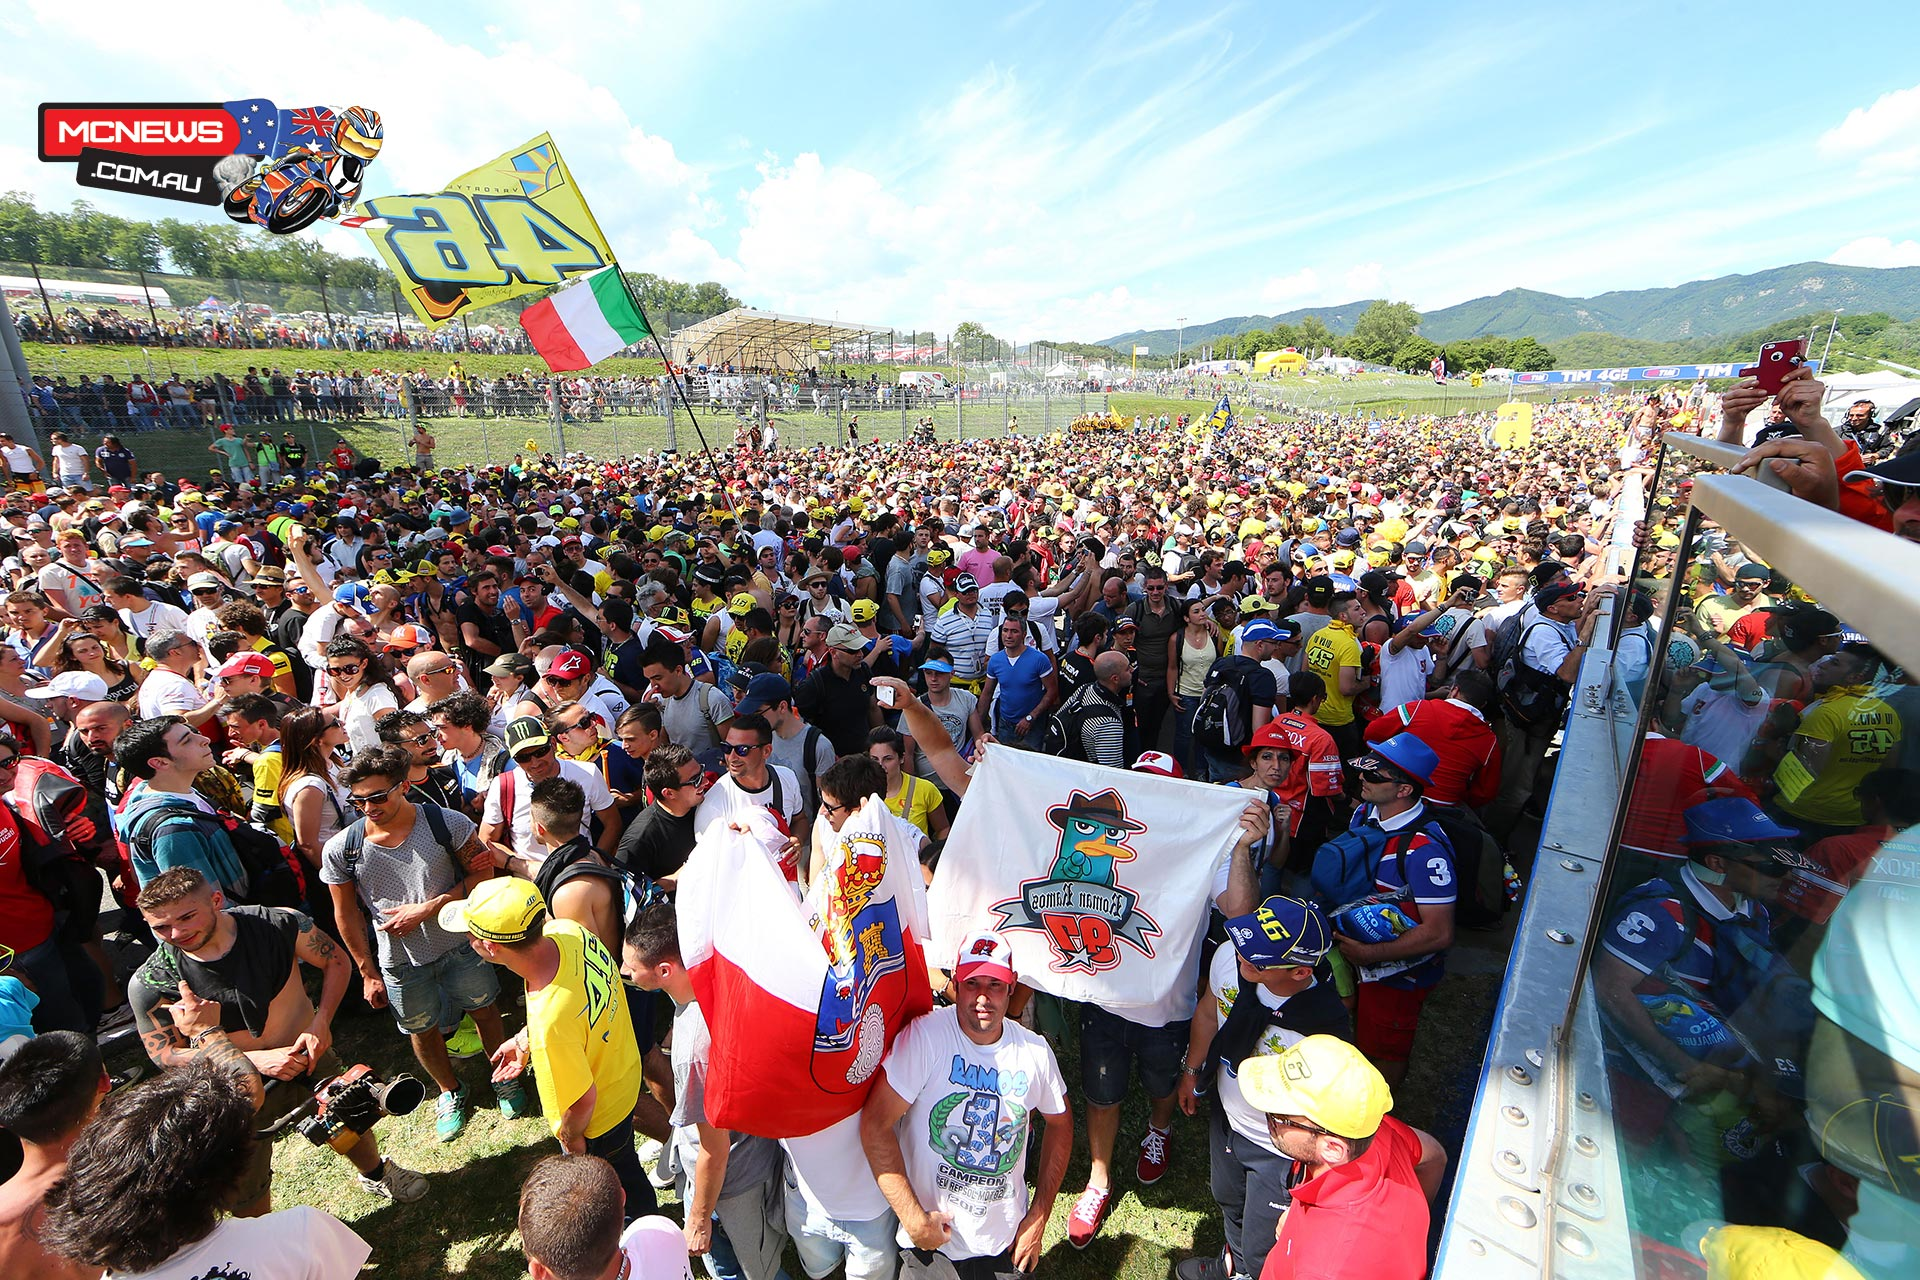 MotoGP 2014 Mugello - Always a huge crowd at the Italian MotoGP